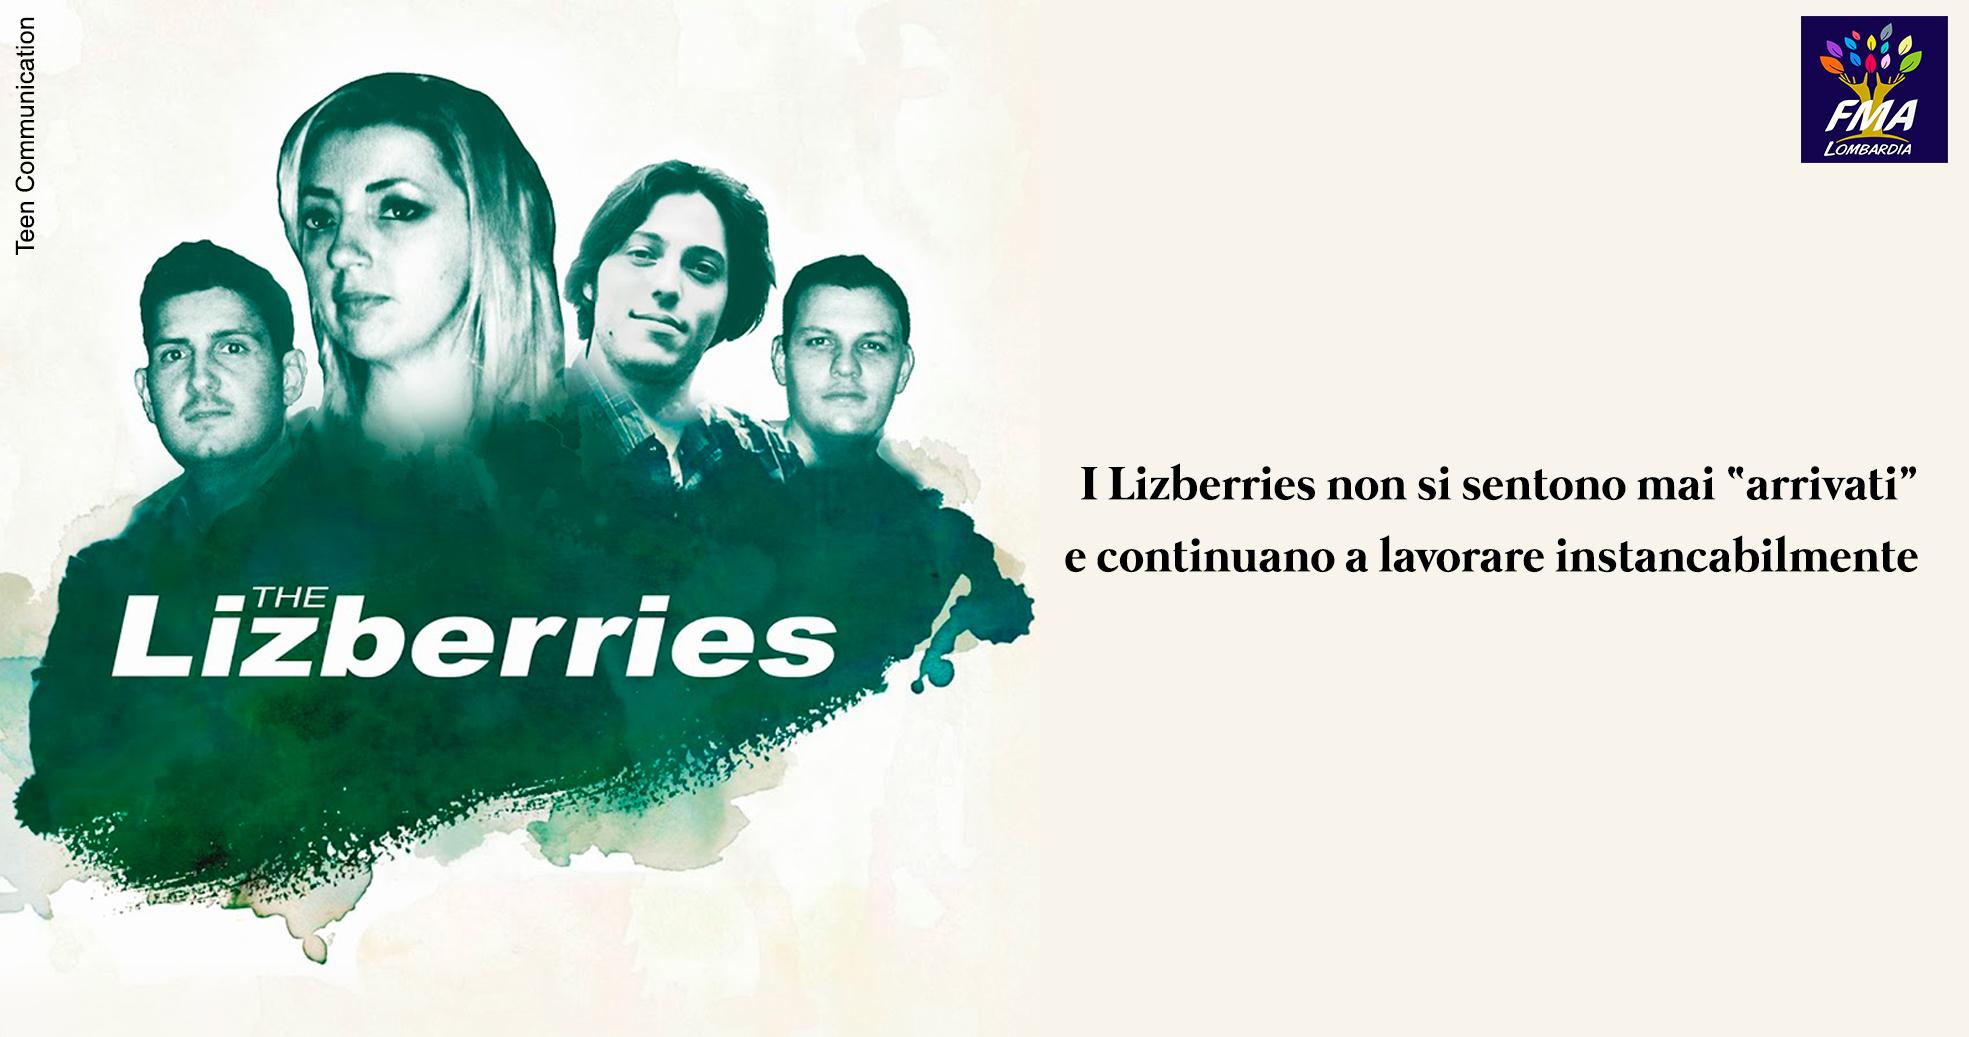 Lizberries: una storia d'amicizia